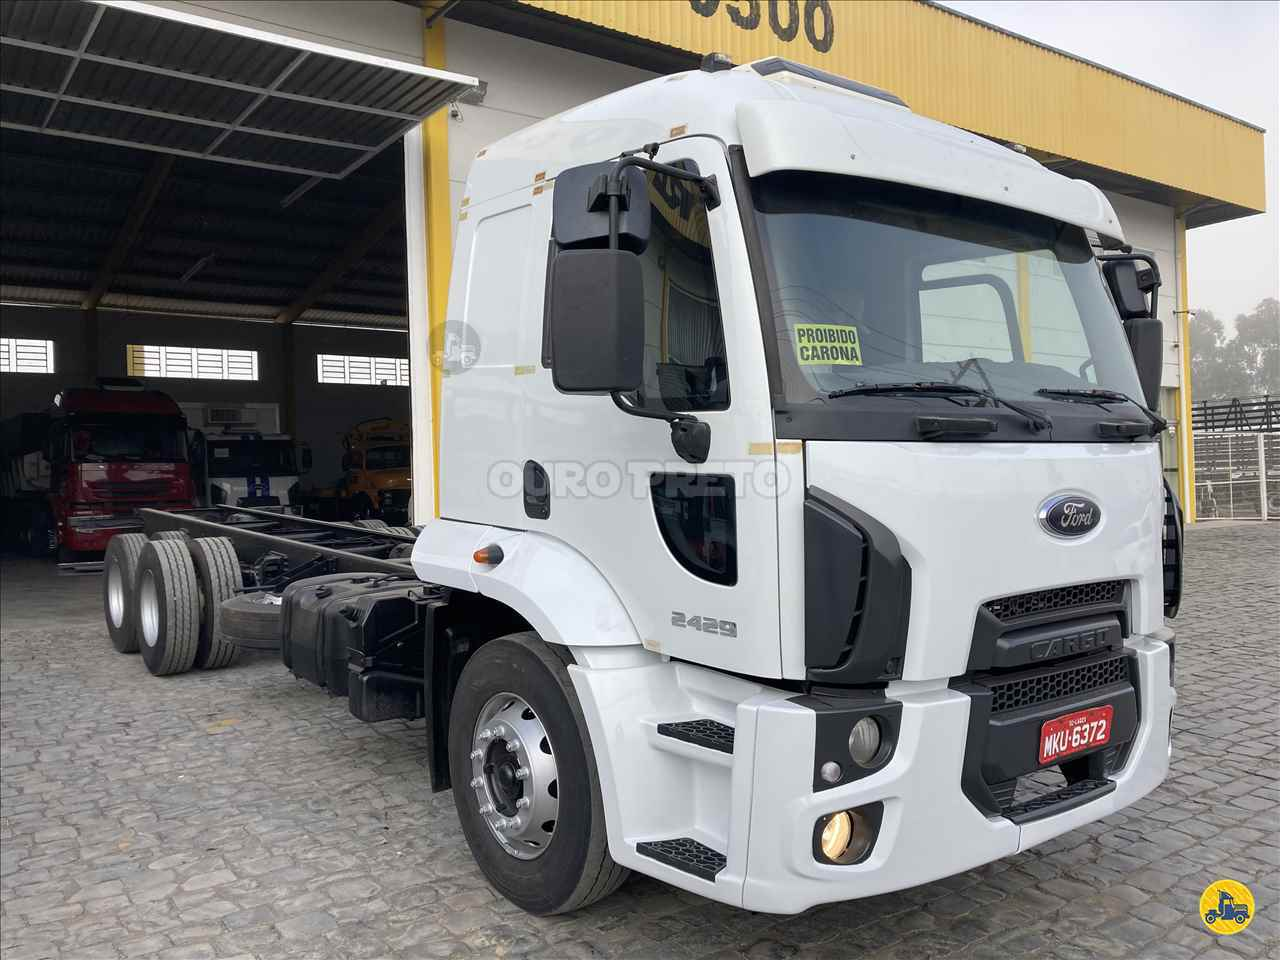 CAMINHAO FORD CARGO 2429 Chassis Truck 6x2 Ouro Preto Caminhões LAGES SANTA CATARINA SC